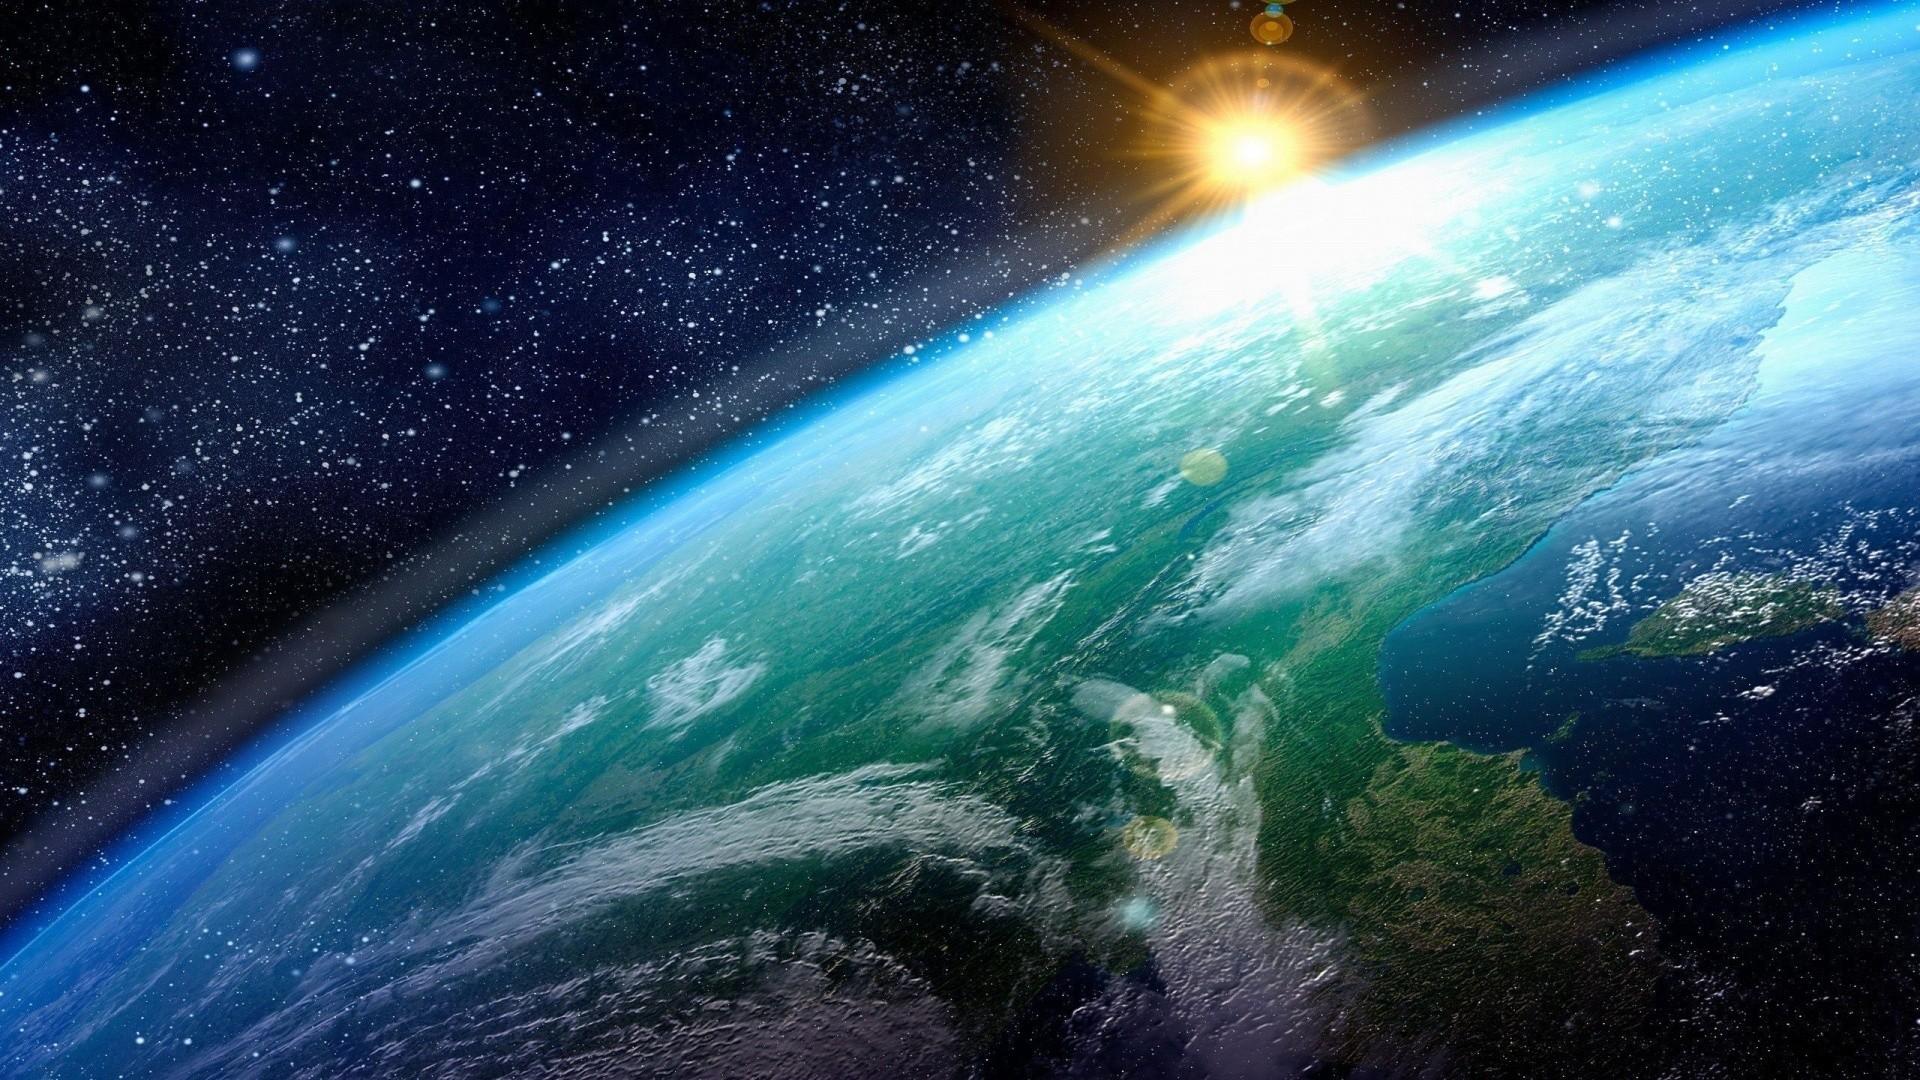 Wallpaper earth, sun, planet, surface, stars